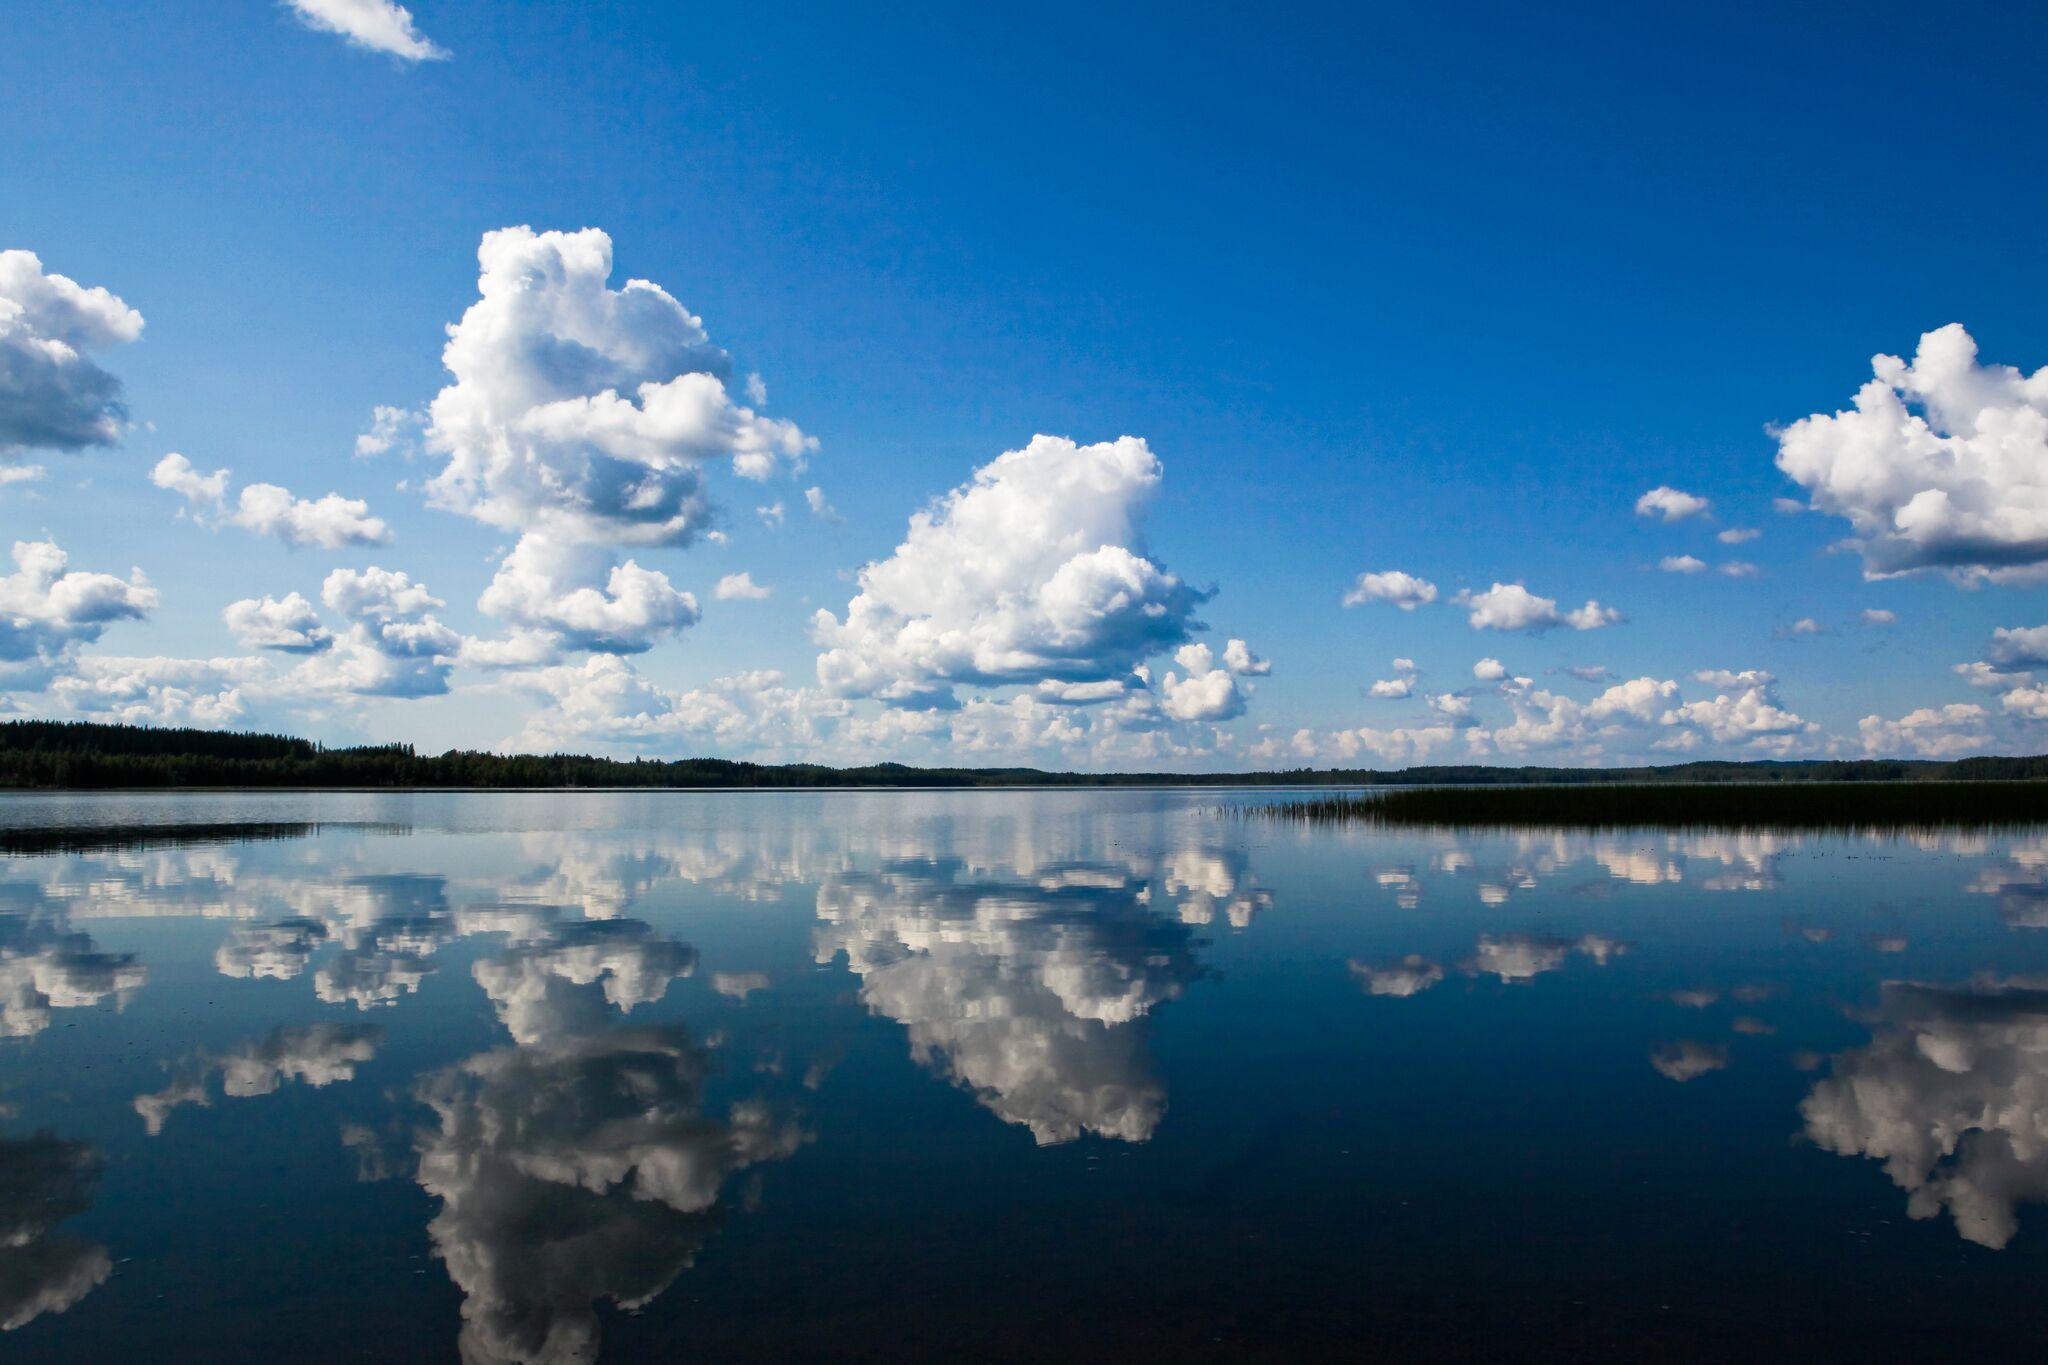 Finnland lakeland.jpeg